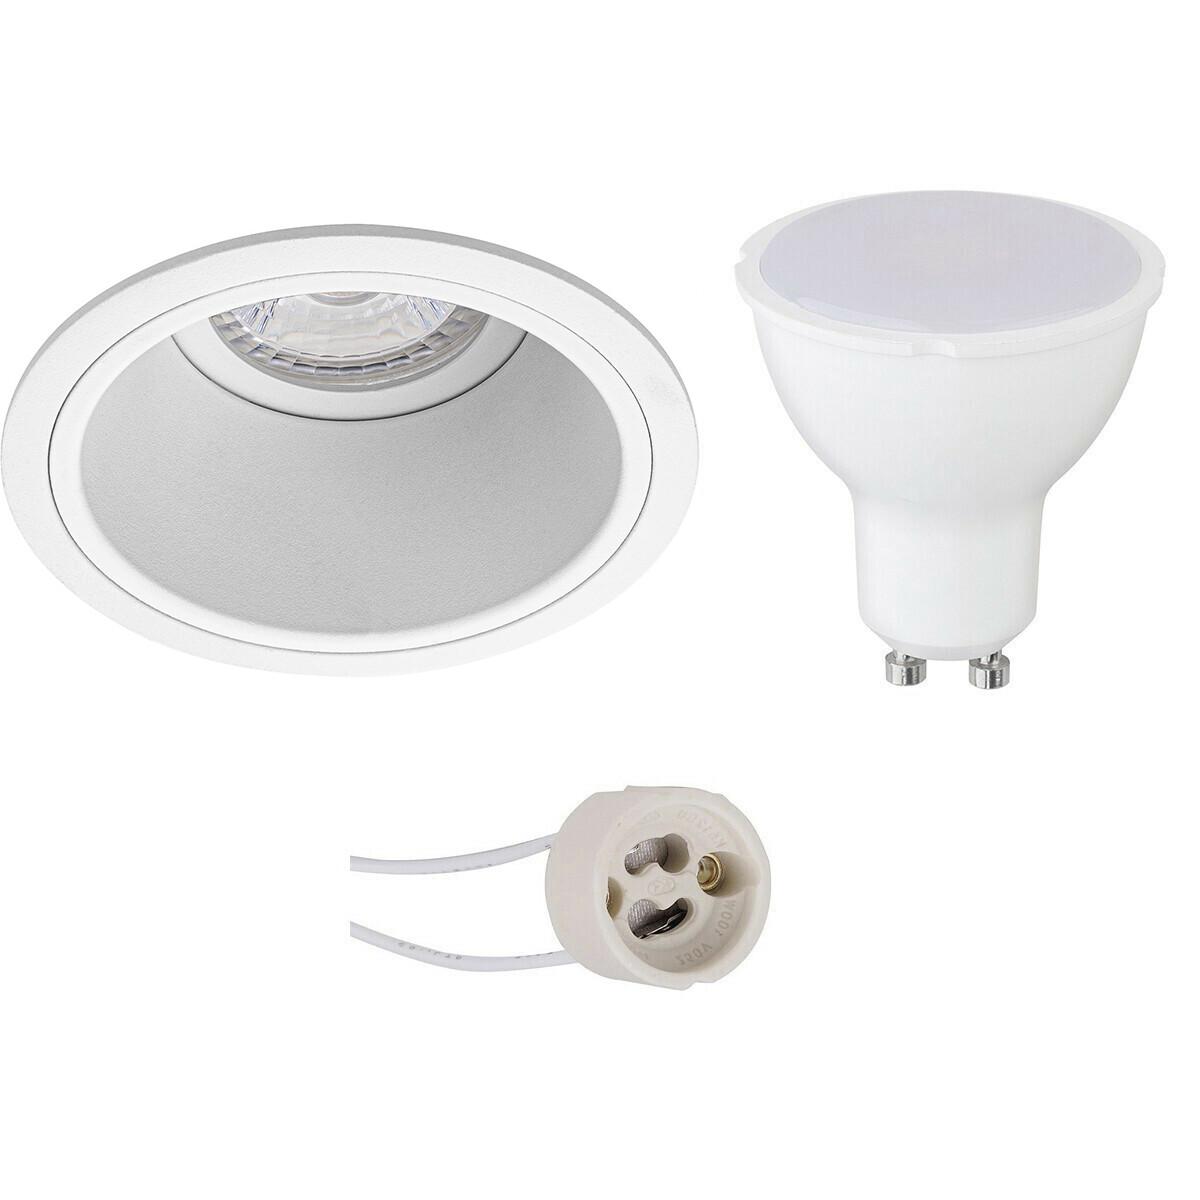 LED Spot Set - Pragmi Minko Pro - GU10 Fitting - Inbouw Rond - Mat Wit - 6W - Natuurlijk Wit 4200K -